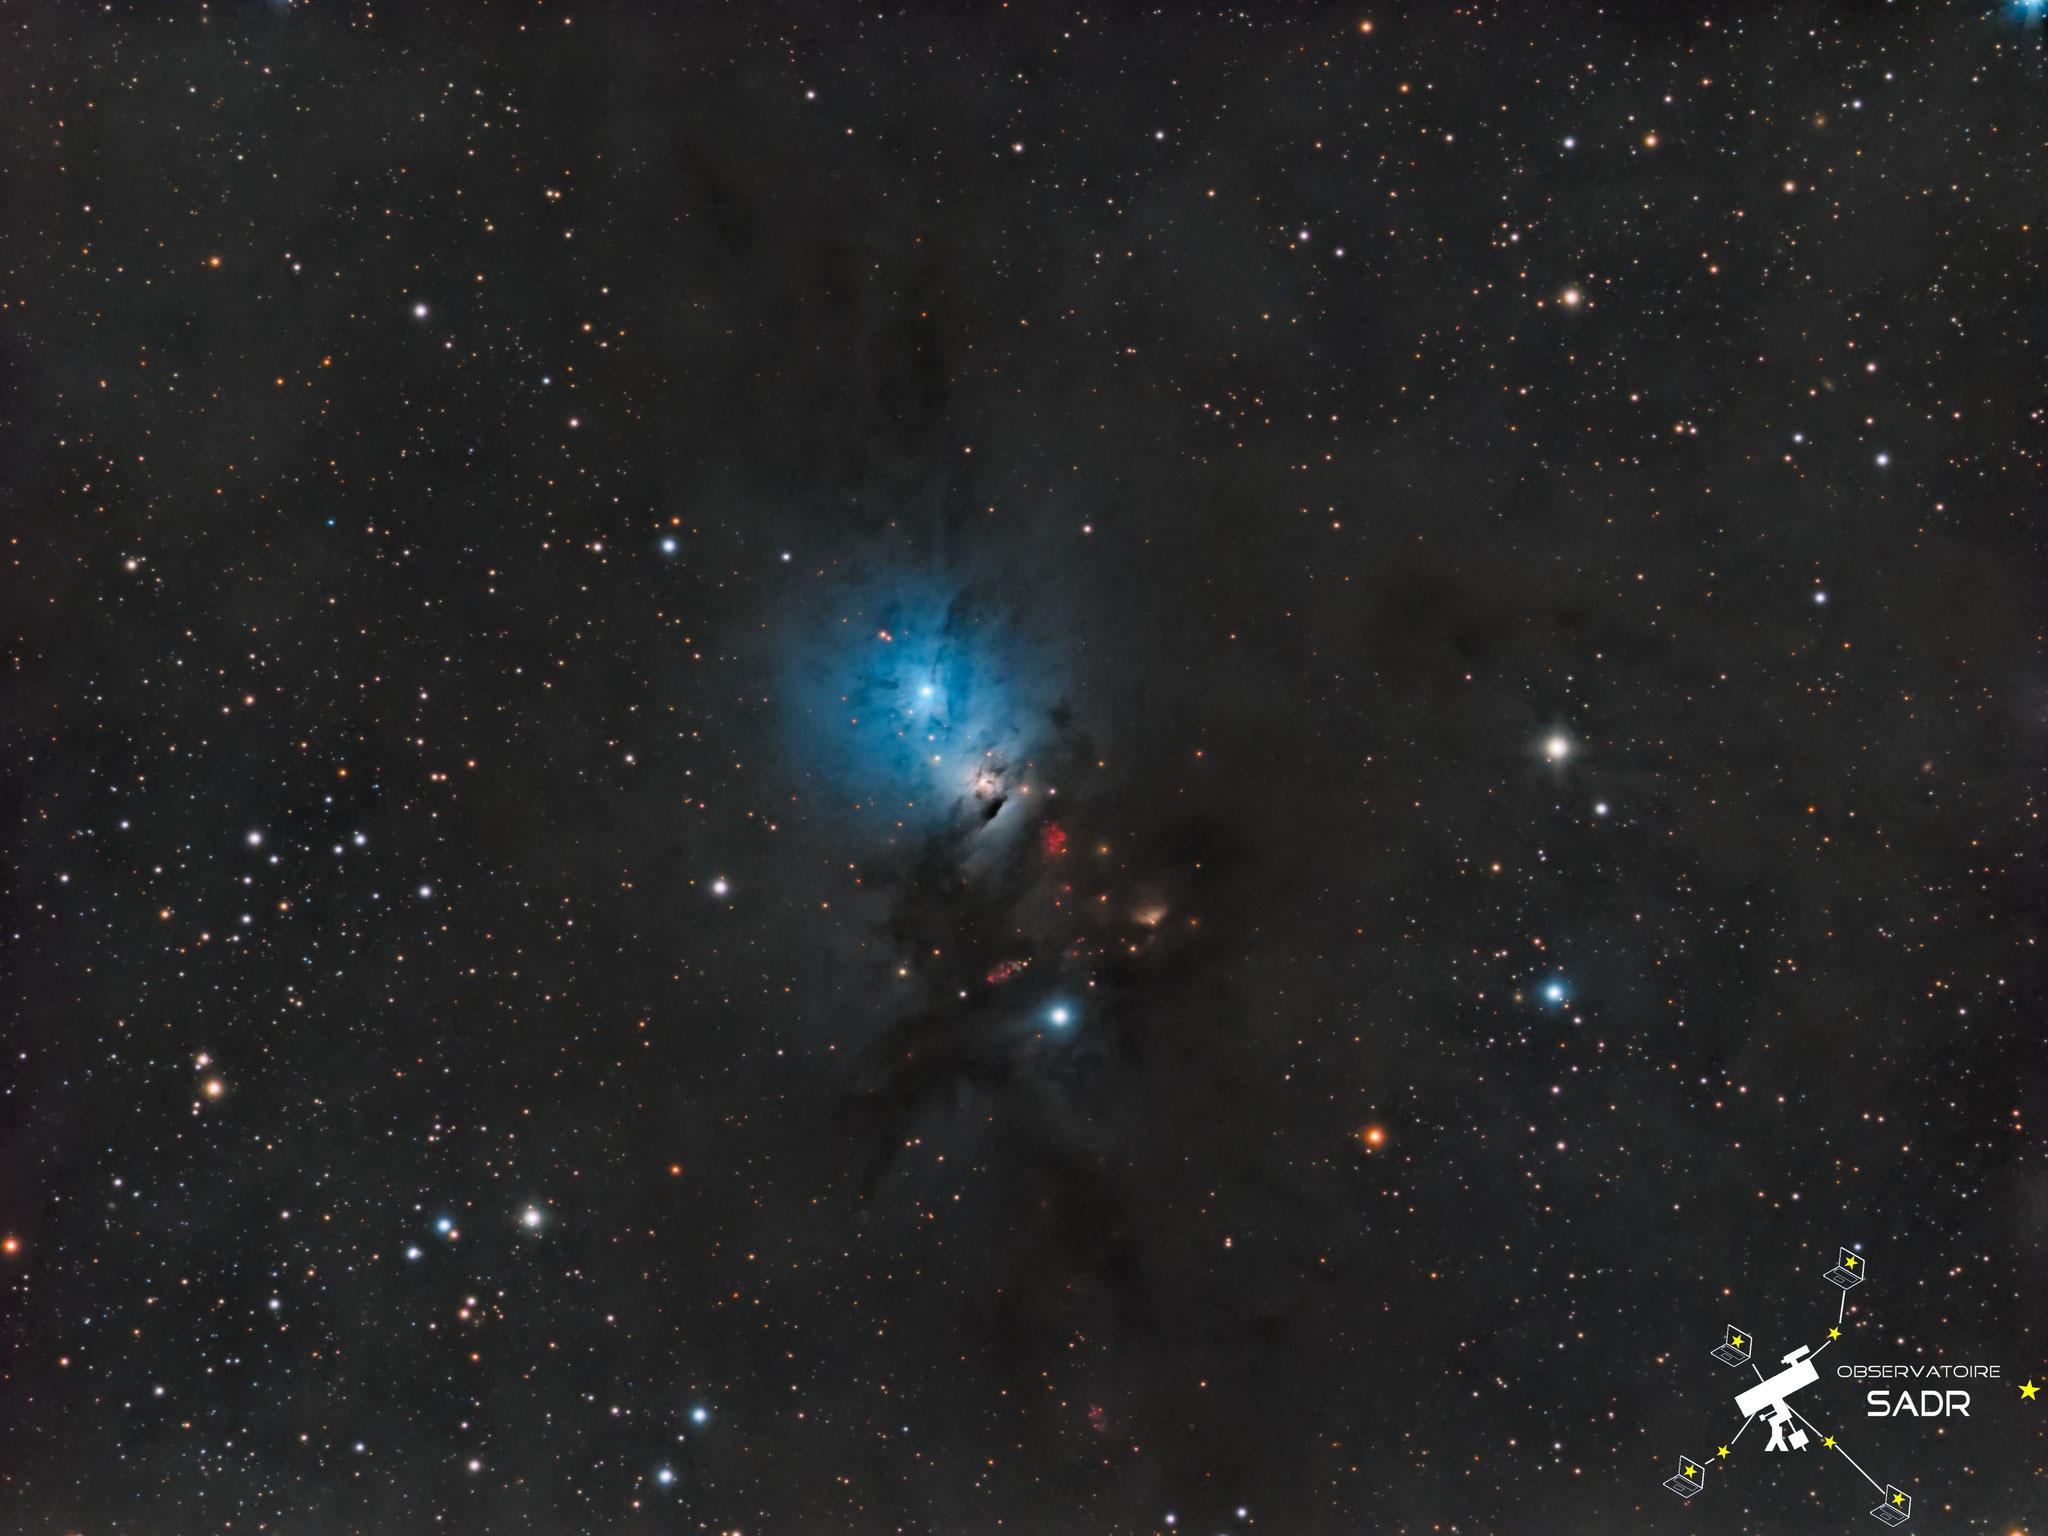 NGC 1333, Lunette 120, Sadr Espagne